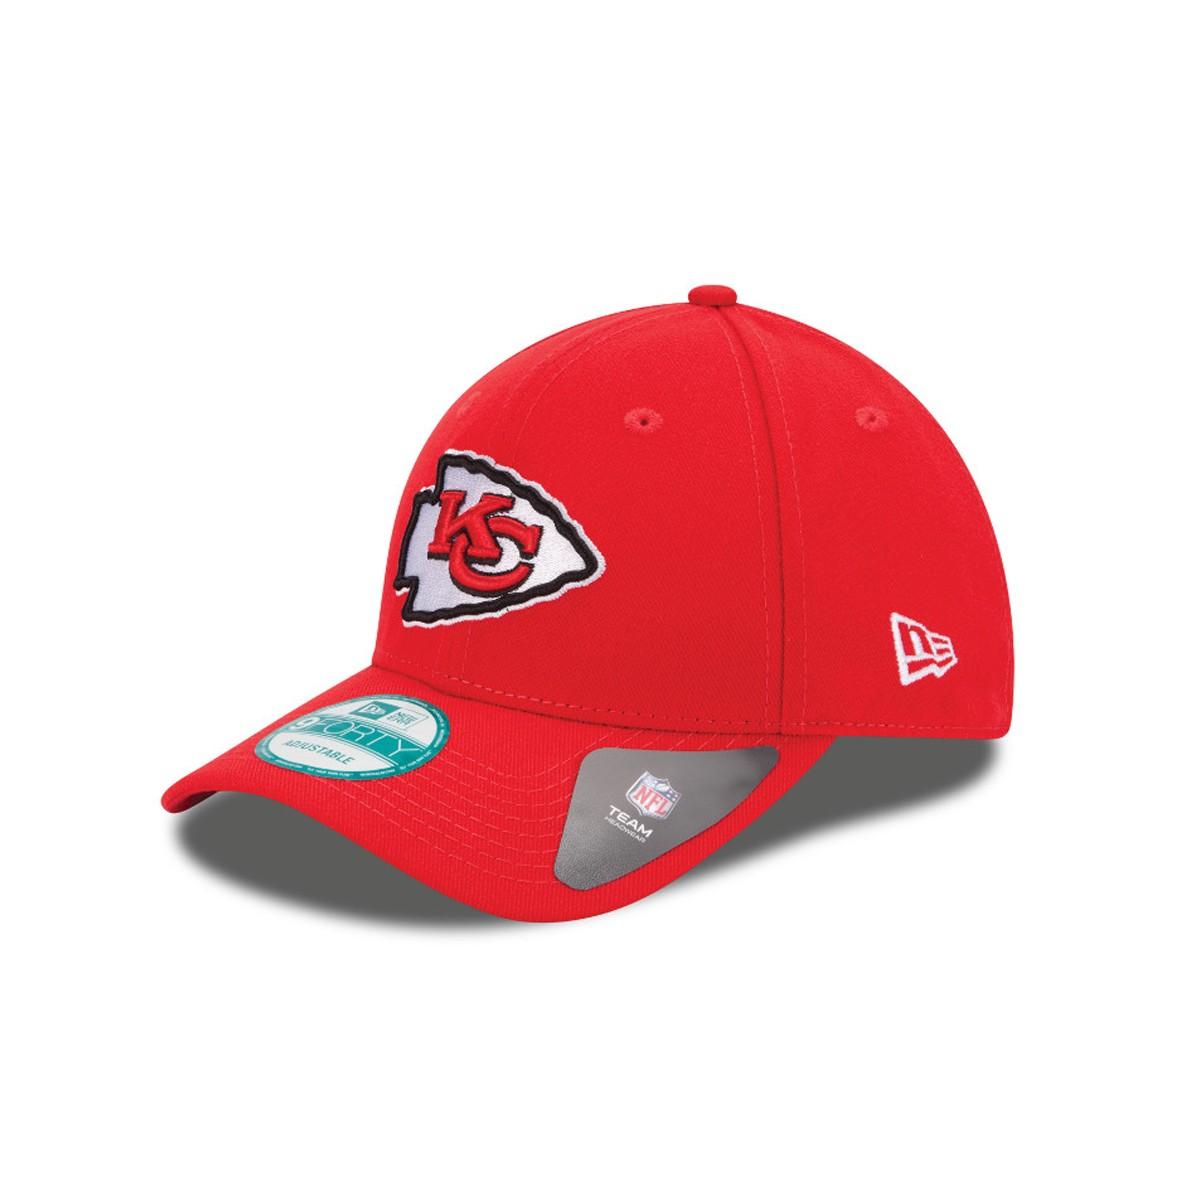 Cappello New Era 9forty The League Nfl Kansas City Chiefs